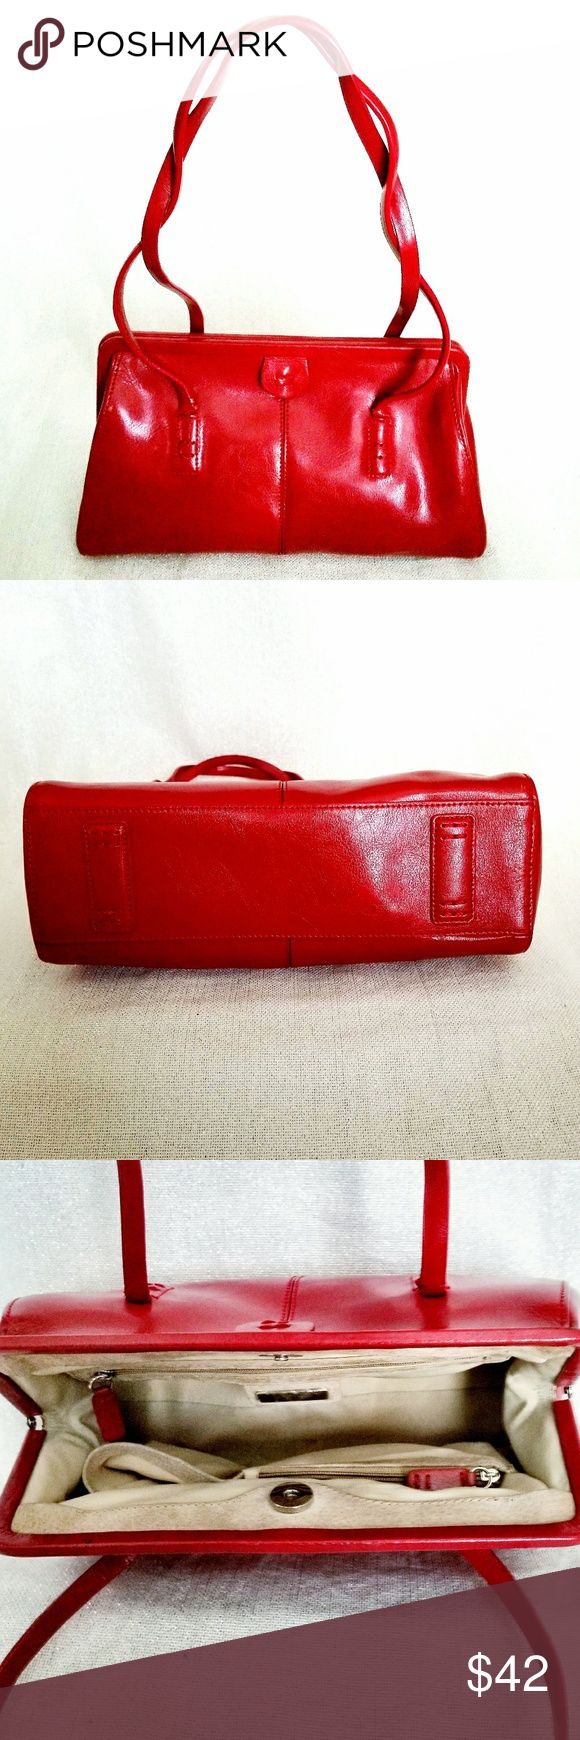 ALDO Handbag Beautiful Aldo handbag in a classic and elegant design. Perfect for the most festive celebrations of the holiday season. In EUC. Looks brand new. Aldo Bags